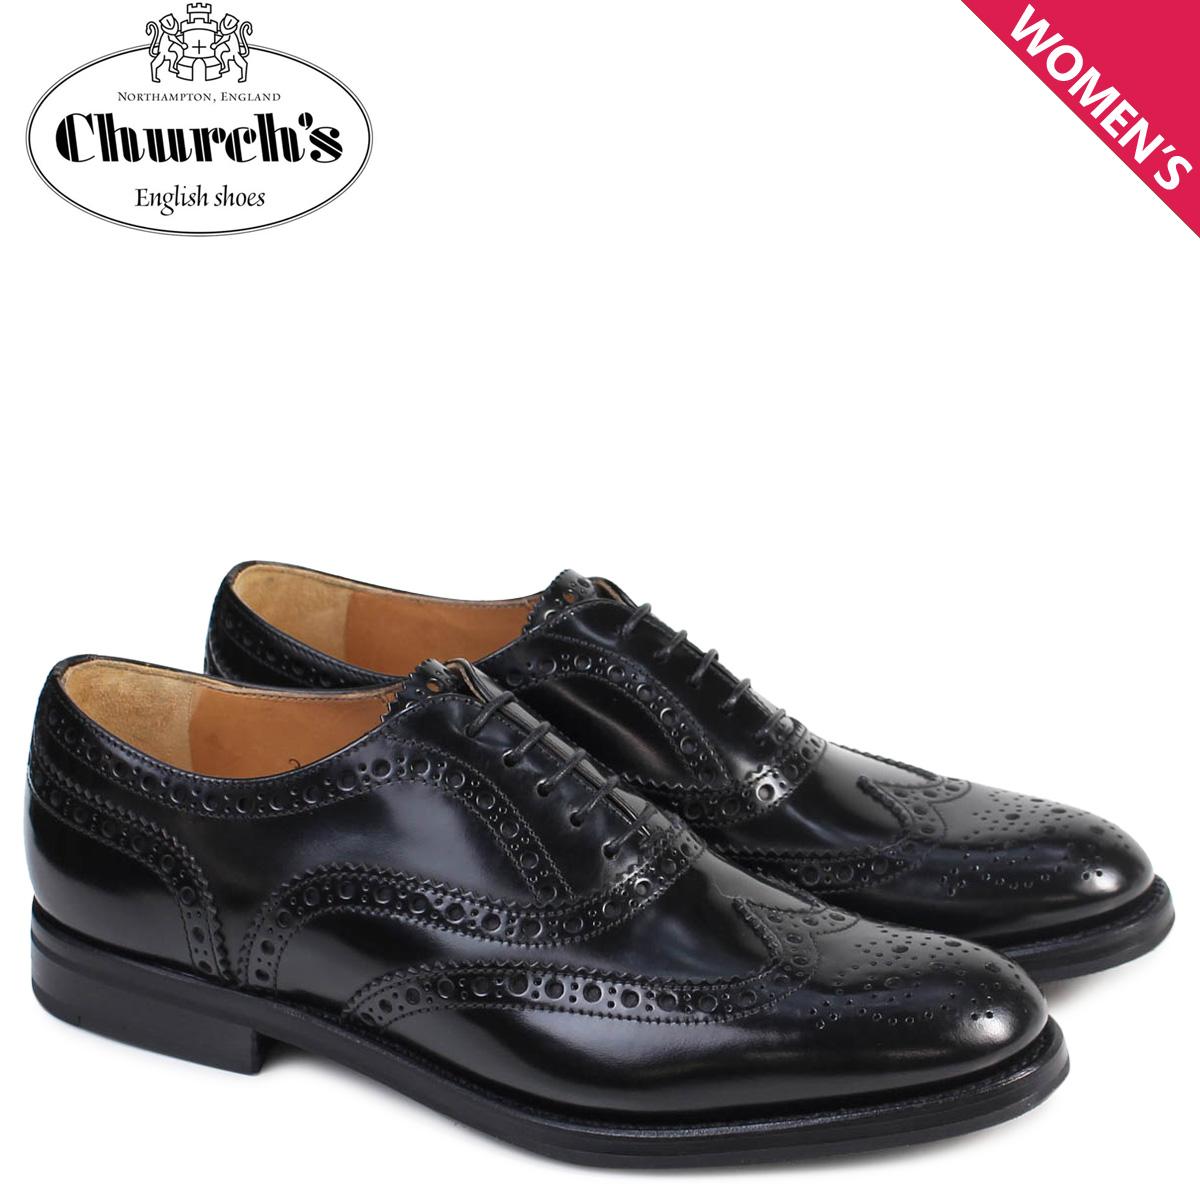 Churchs 靴 レディース チャーチ バーウッド シューズ ウイングチップ Burwood WG Polish Binder Calf 8705 DE0001 ブラック 黒